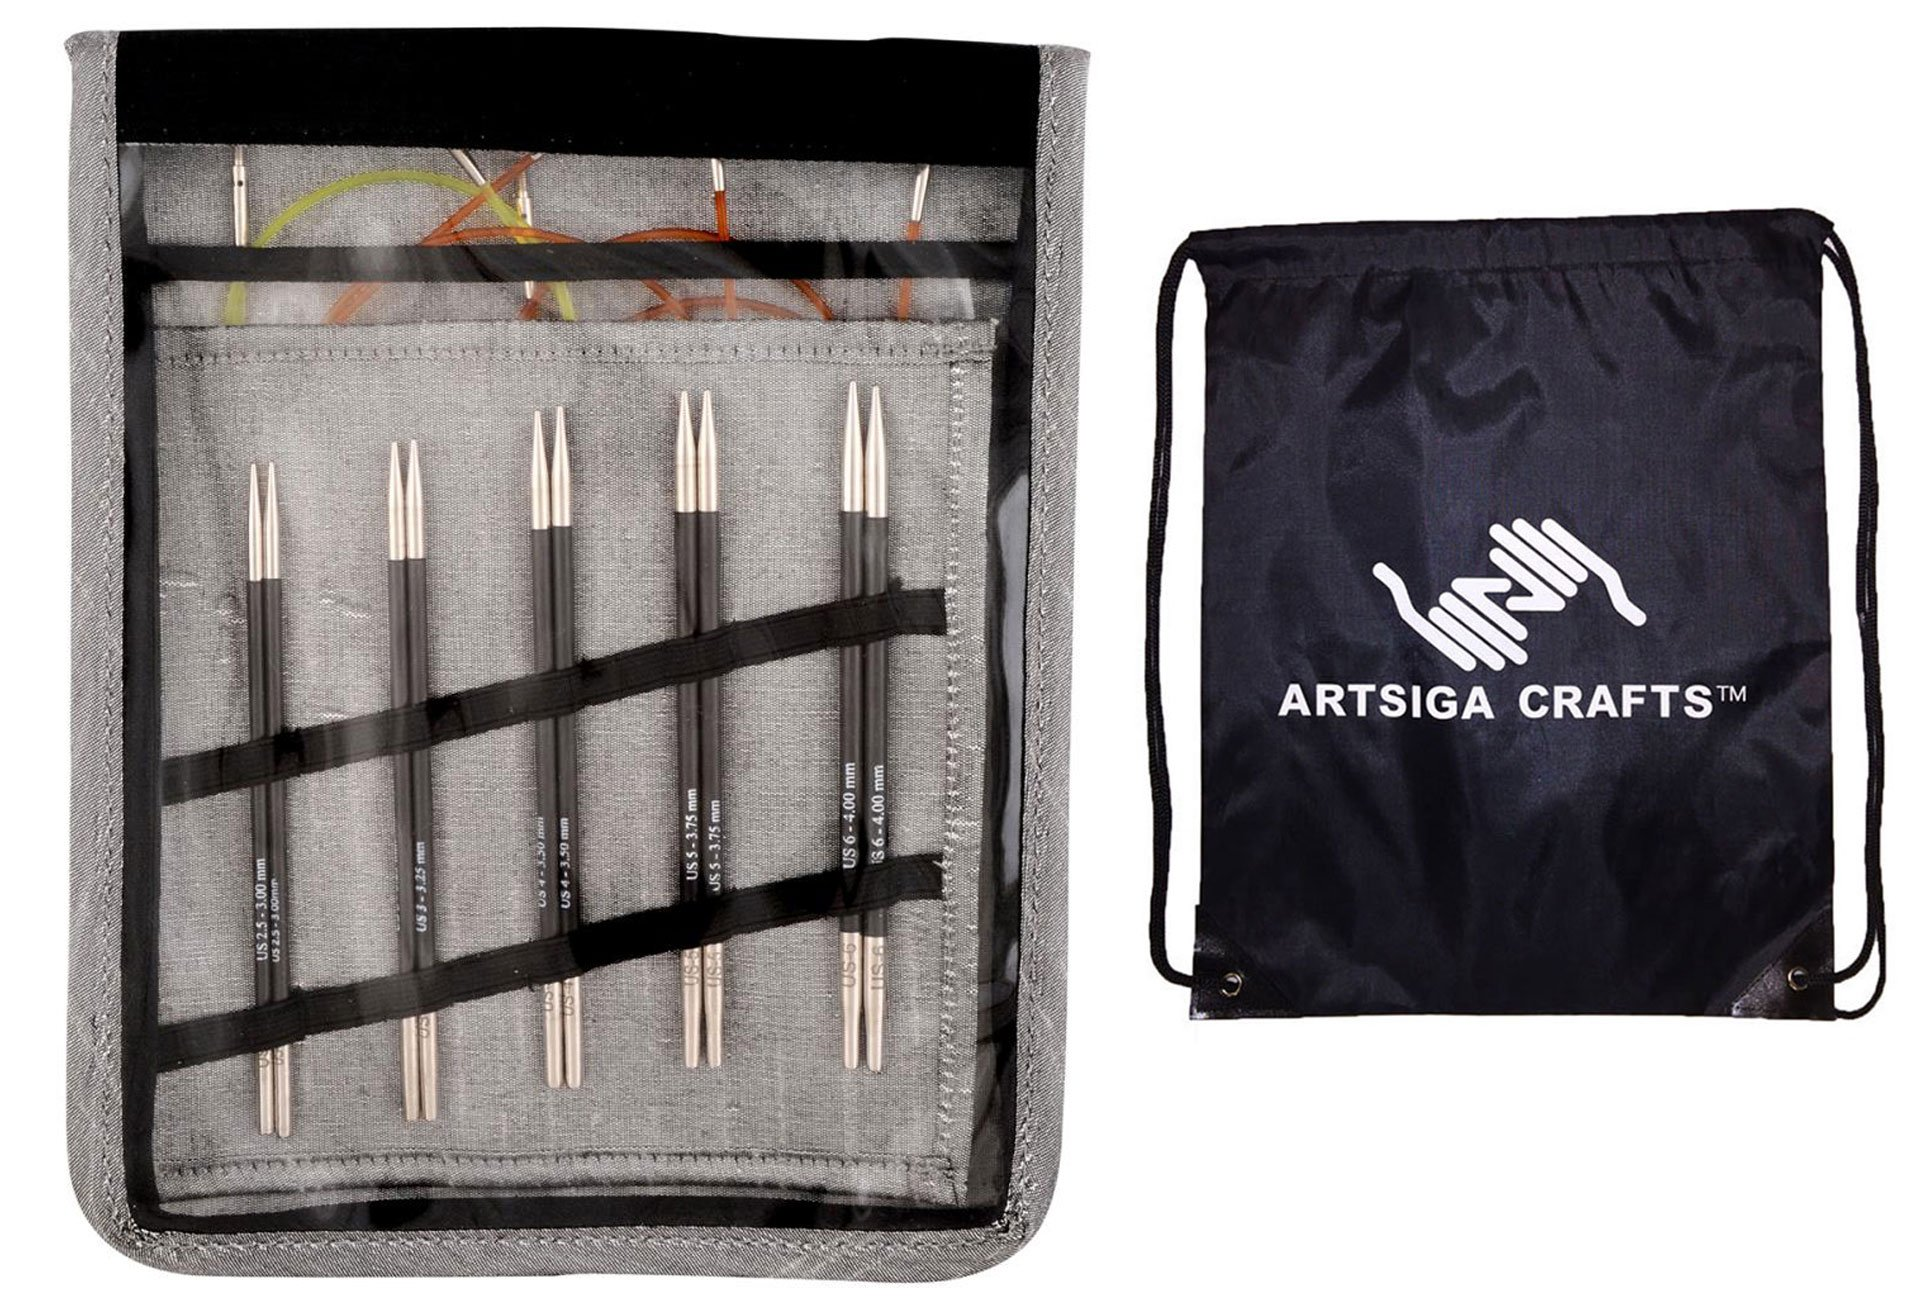 Knitter's Pride Karbonz Starter Interchangeable Long Tip Knitting Needle Set Bundle with 1 Artsiga Crafts Project Bag 110601